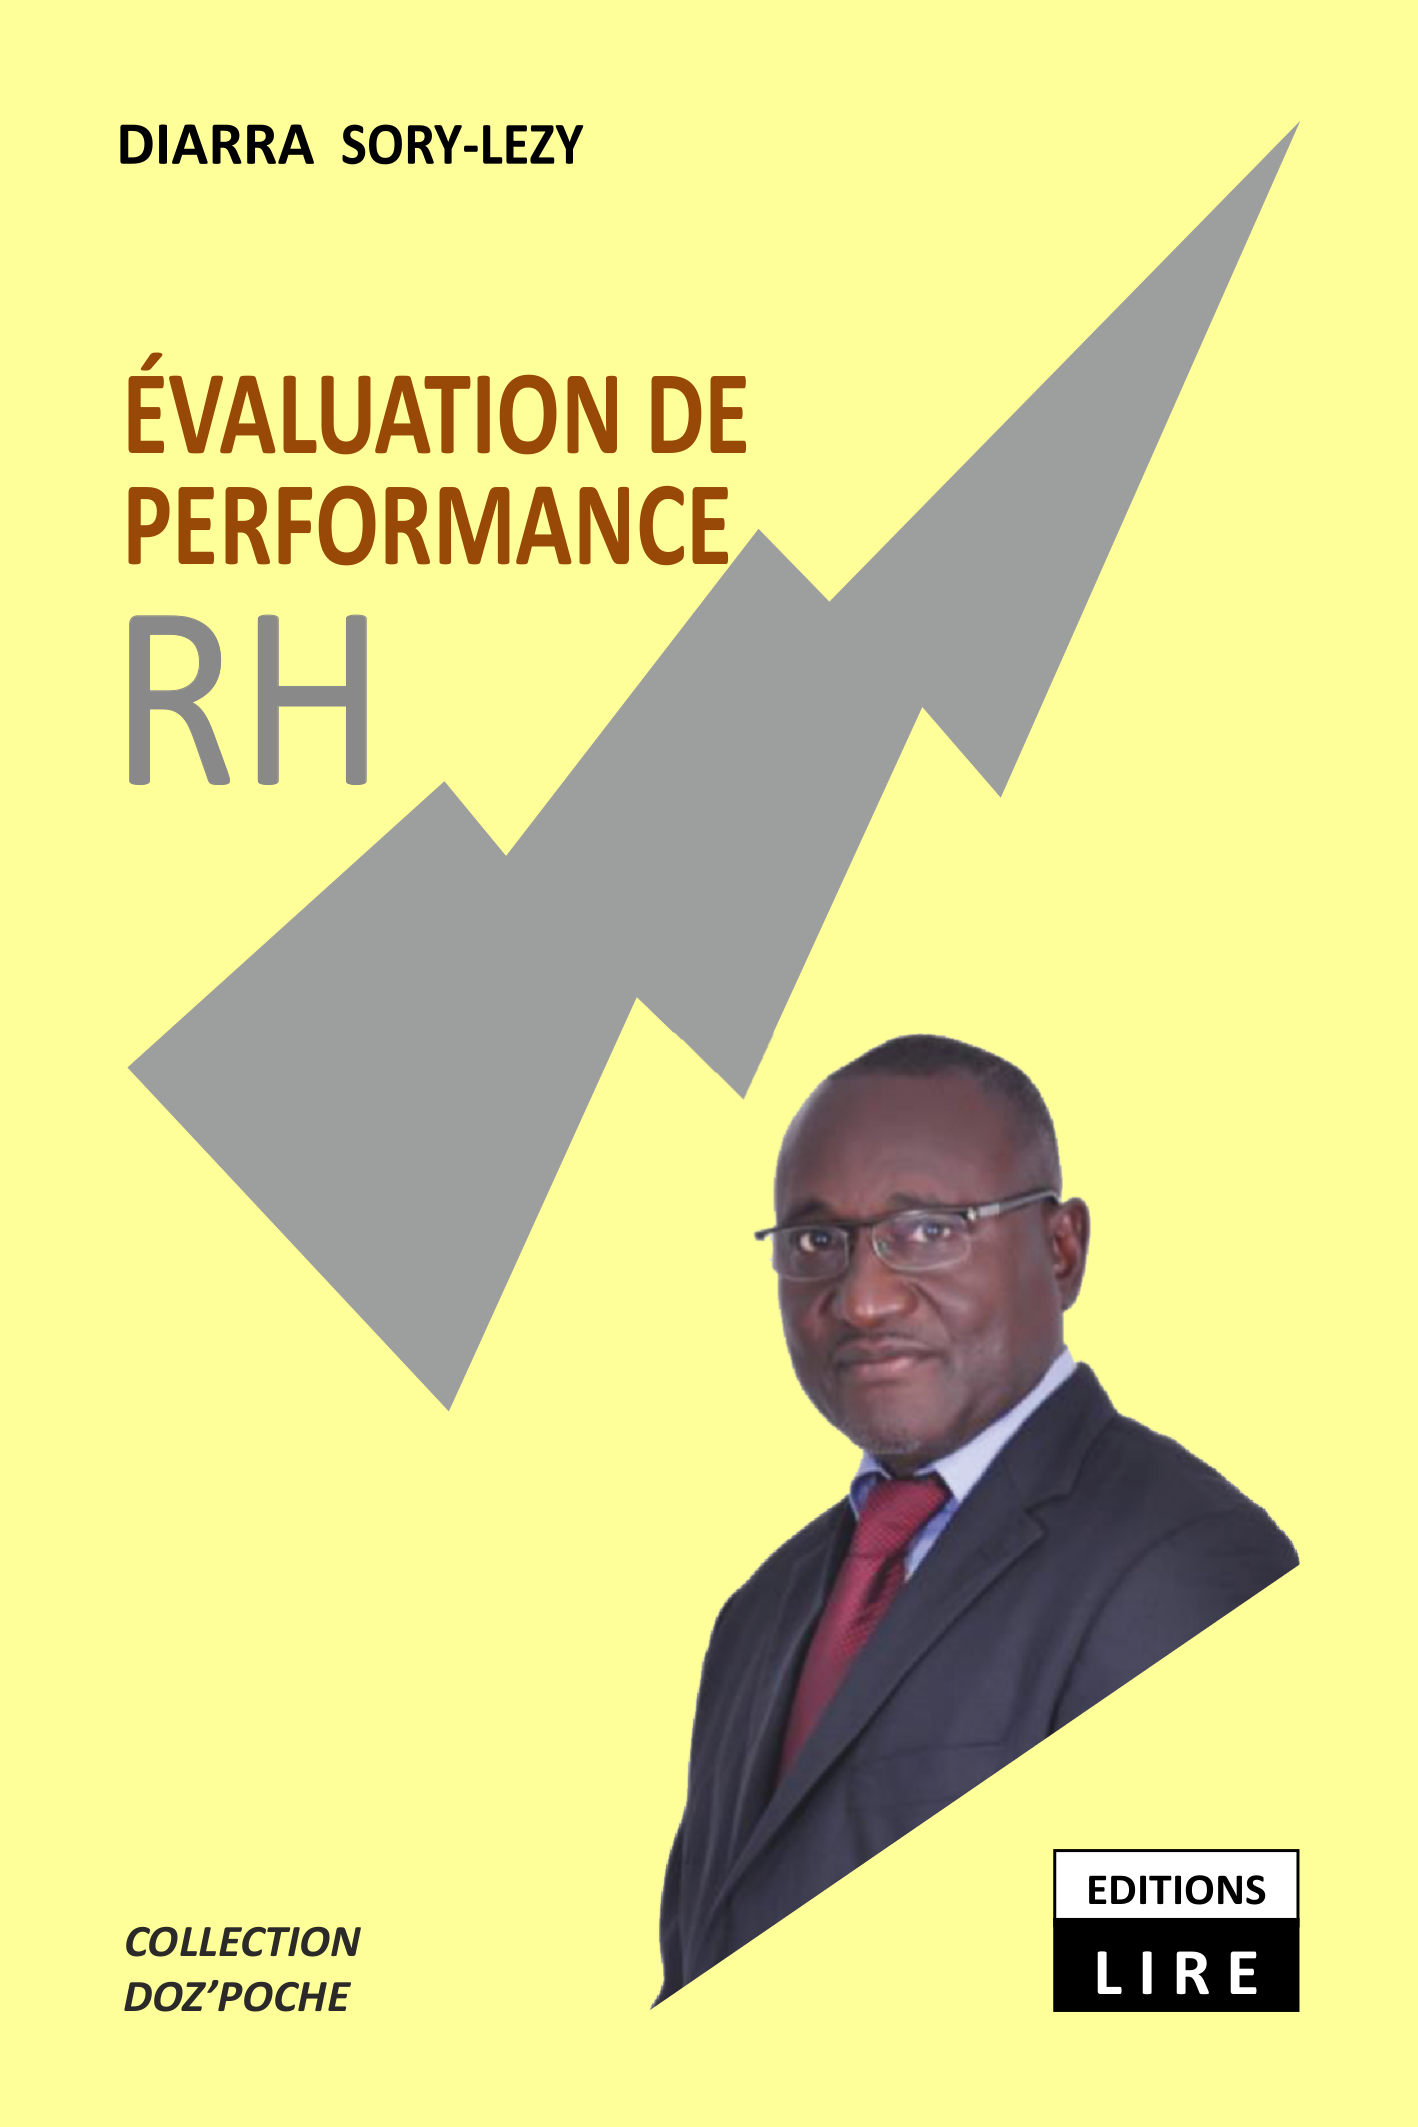 EVALUATION DE PERFORMANCE RH